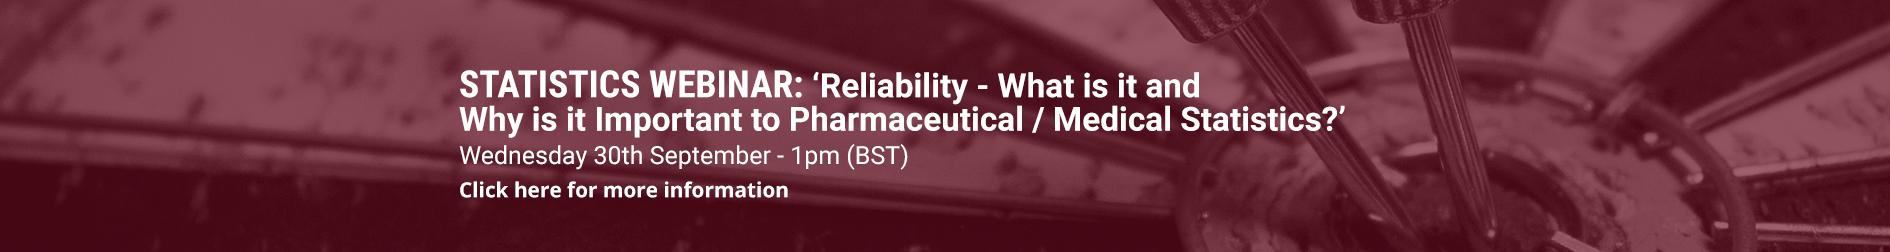 banner_webinar_reliability